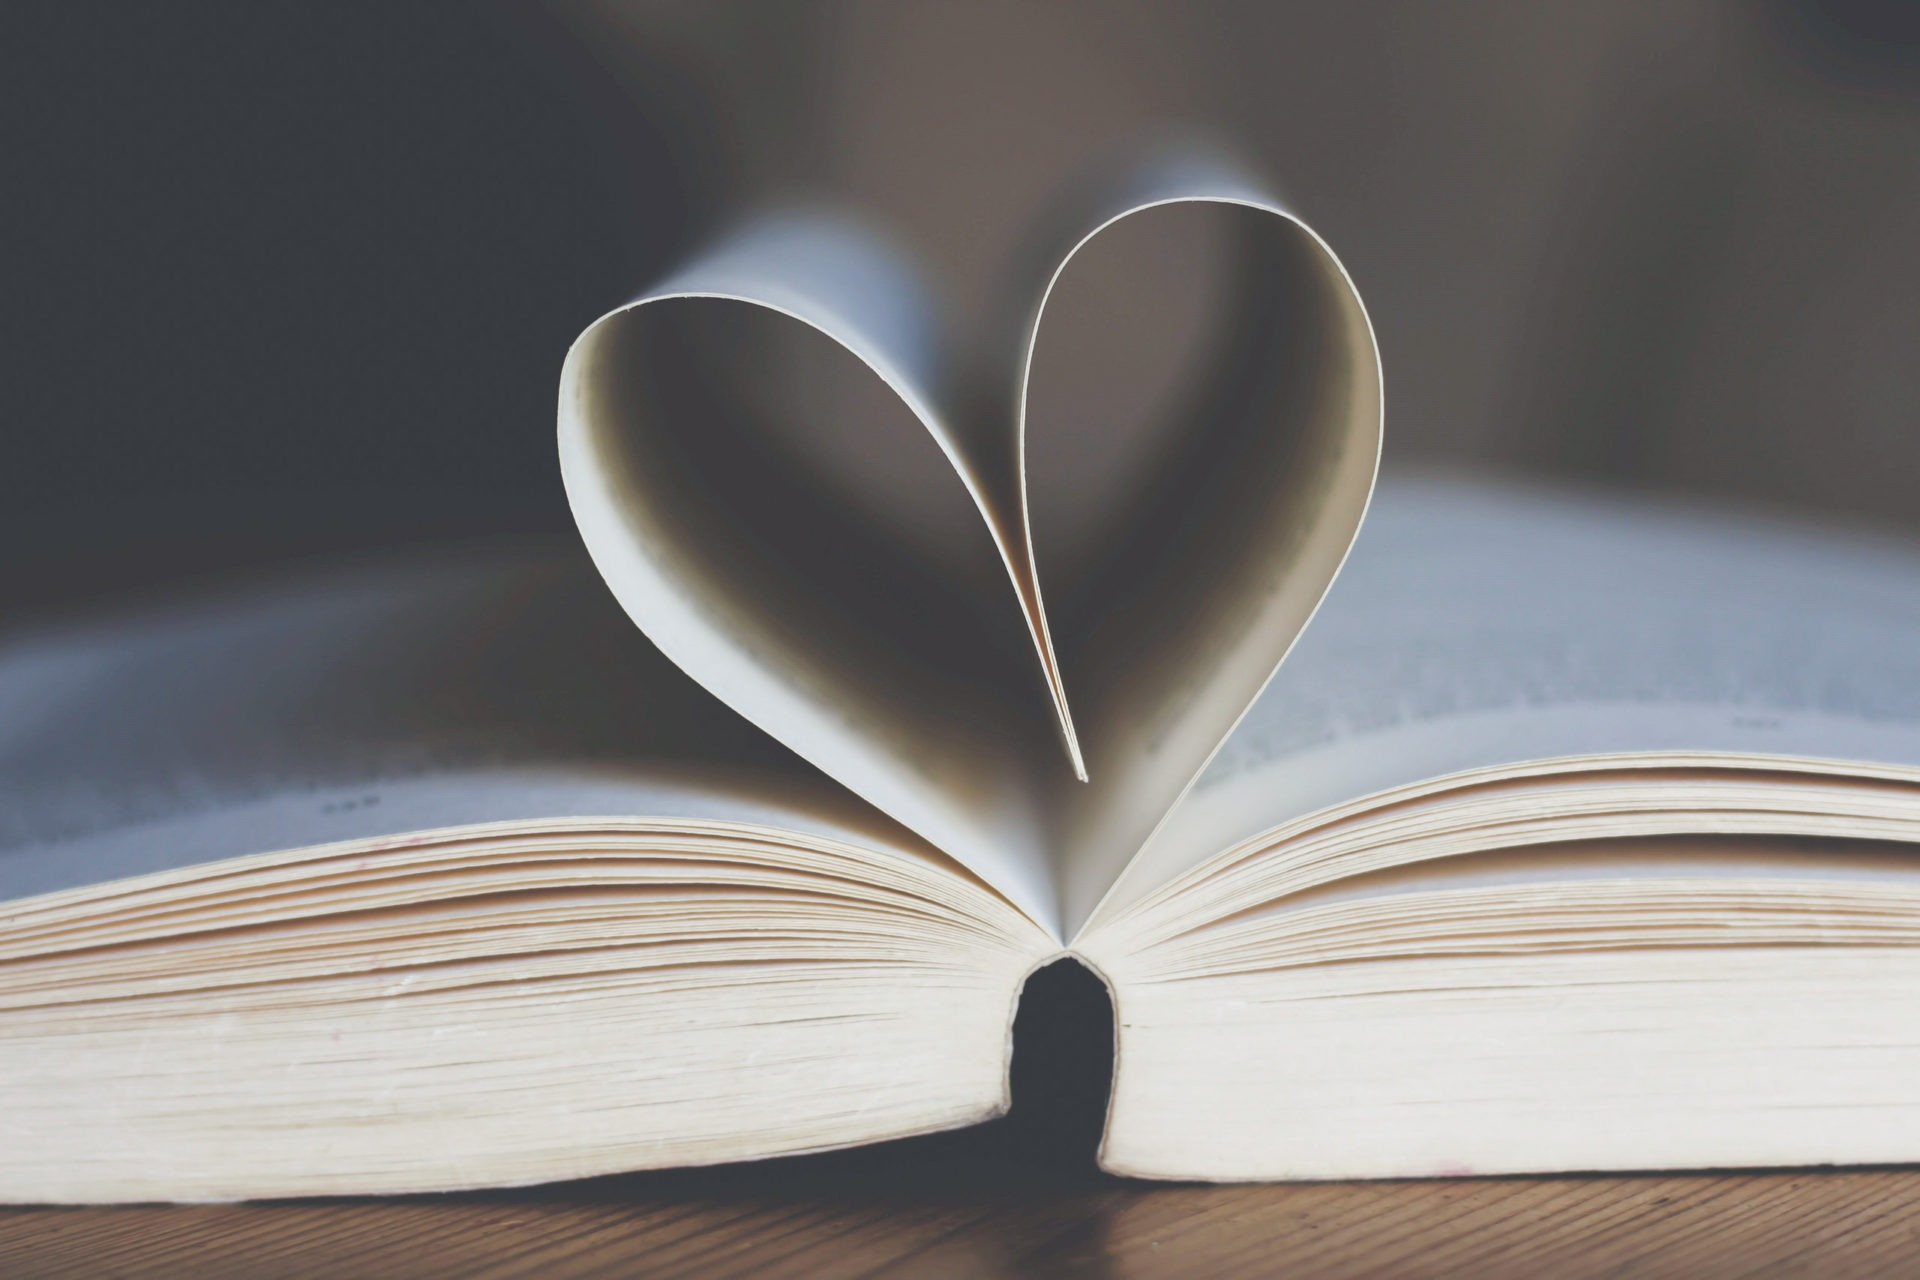 book 3998252linus schutz pixabay 7 - Les globe blogueurs - blog voyage nature